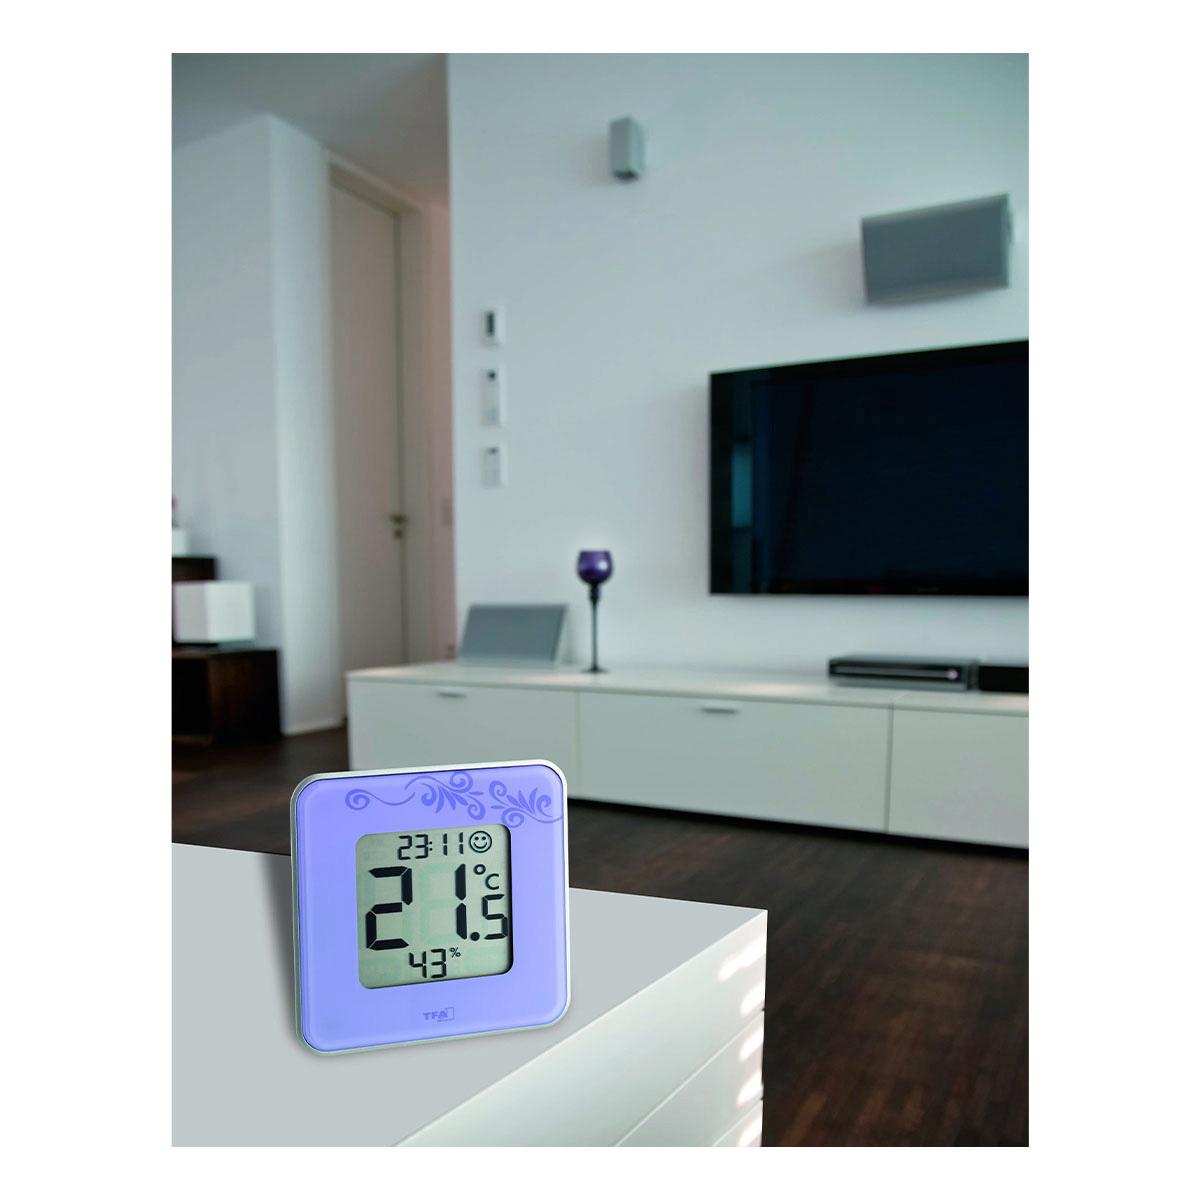 30-5021-11-digitales-thermo-hygrometer-style-anwendung-1200x1200px.jpg